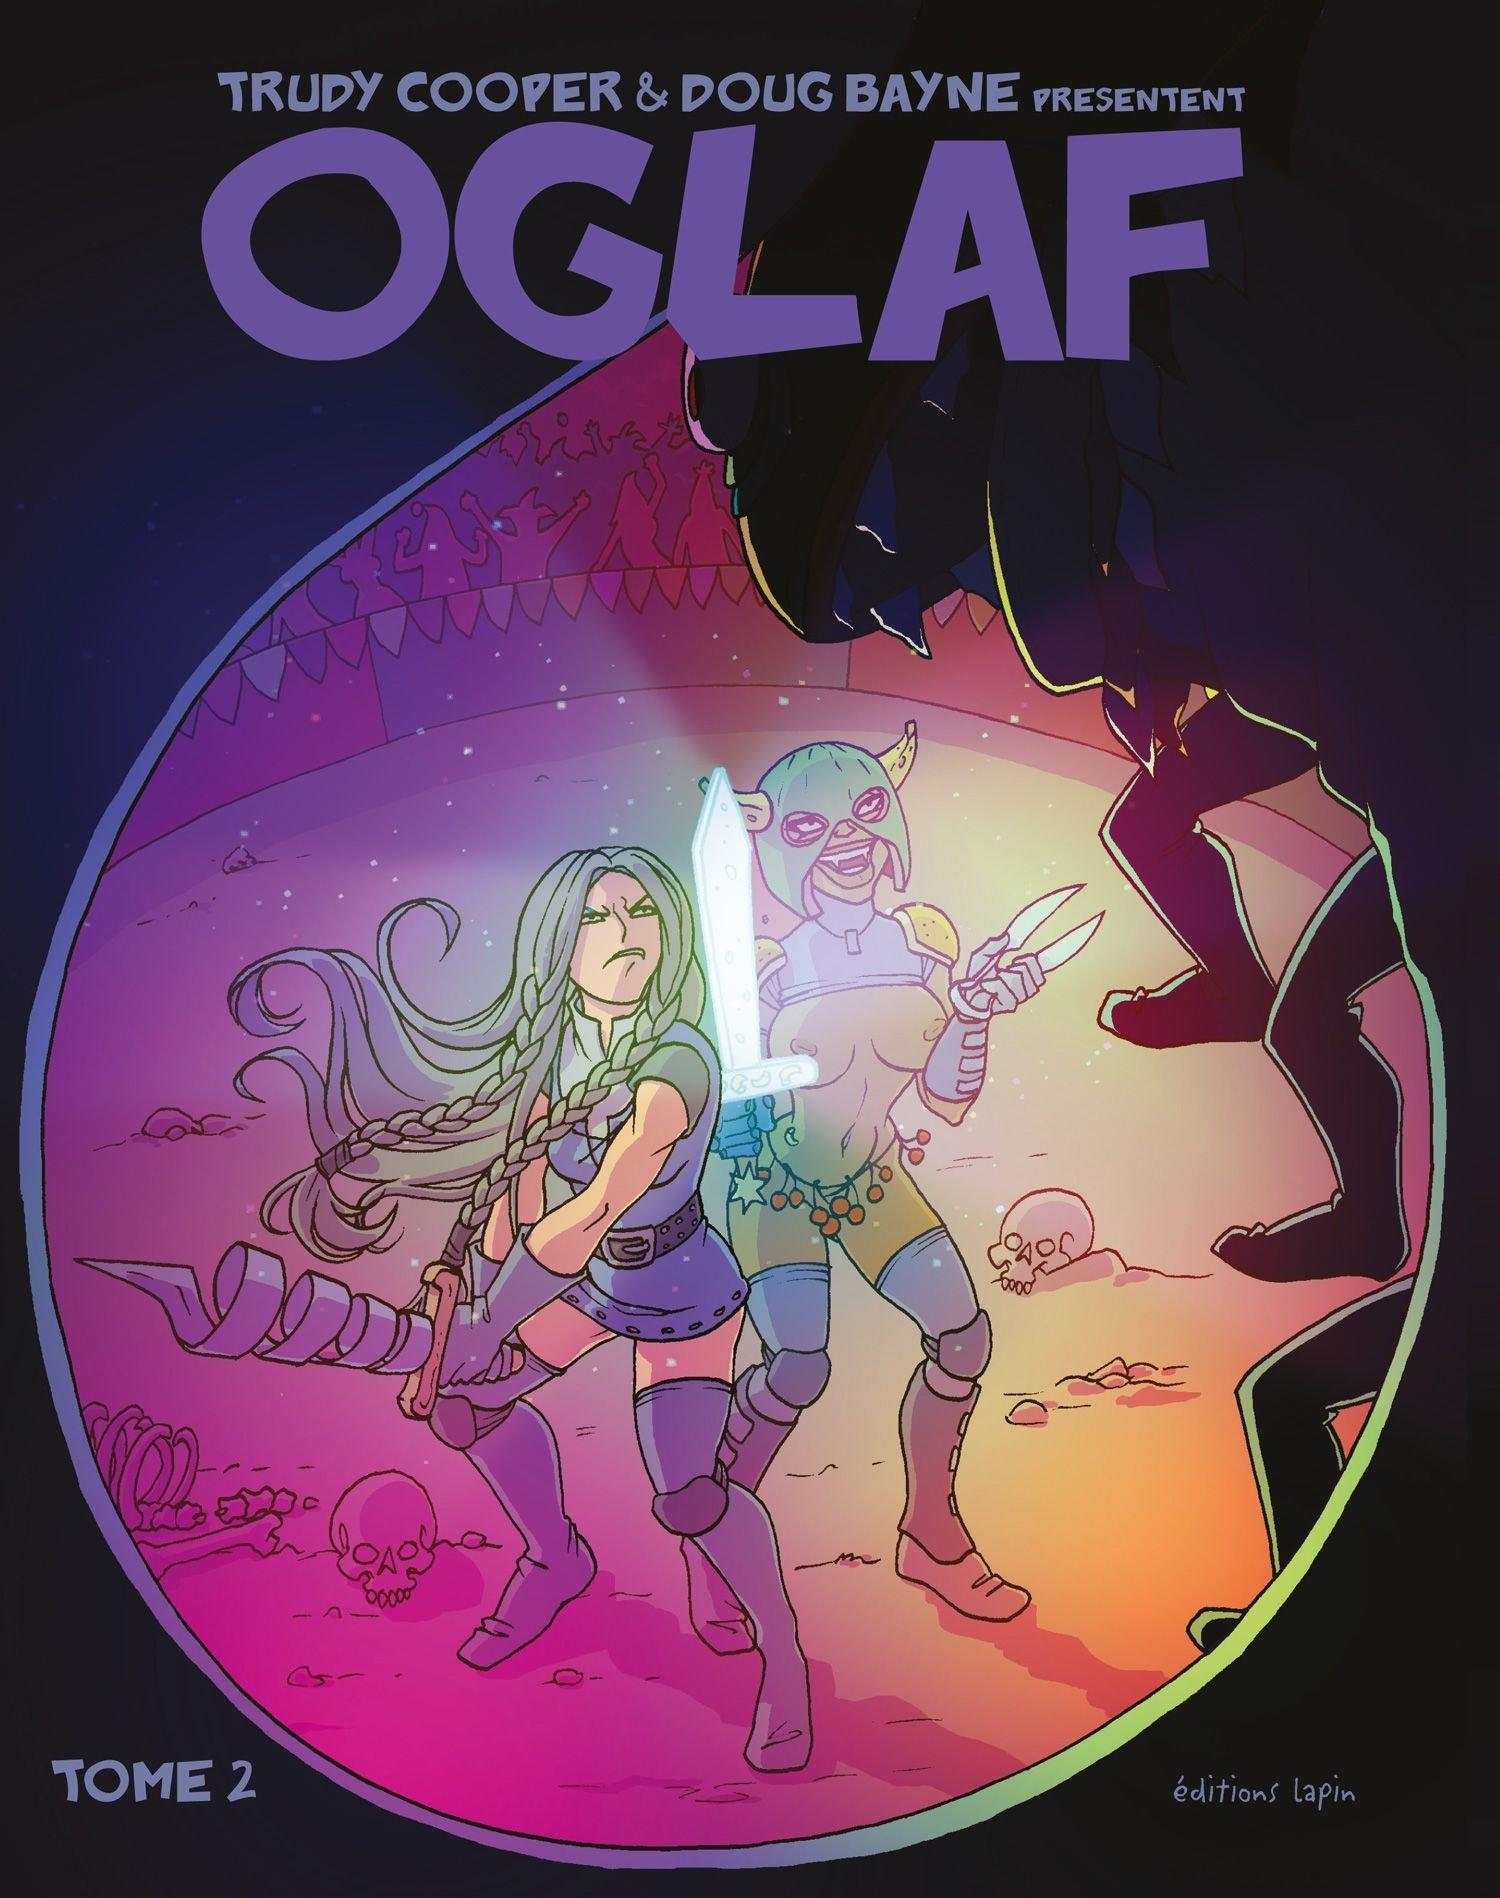 Oglaf, tome 2 Album – 6 juillet 2015 Trudy Cooper Doug Bayne éditions lapin 2918653594